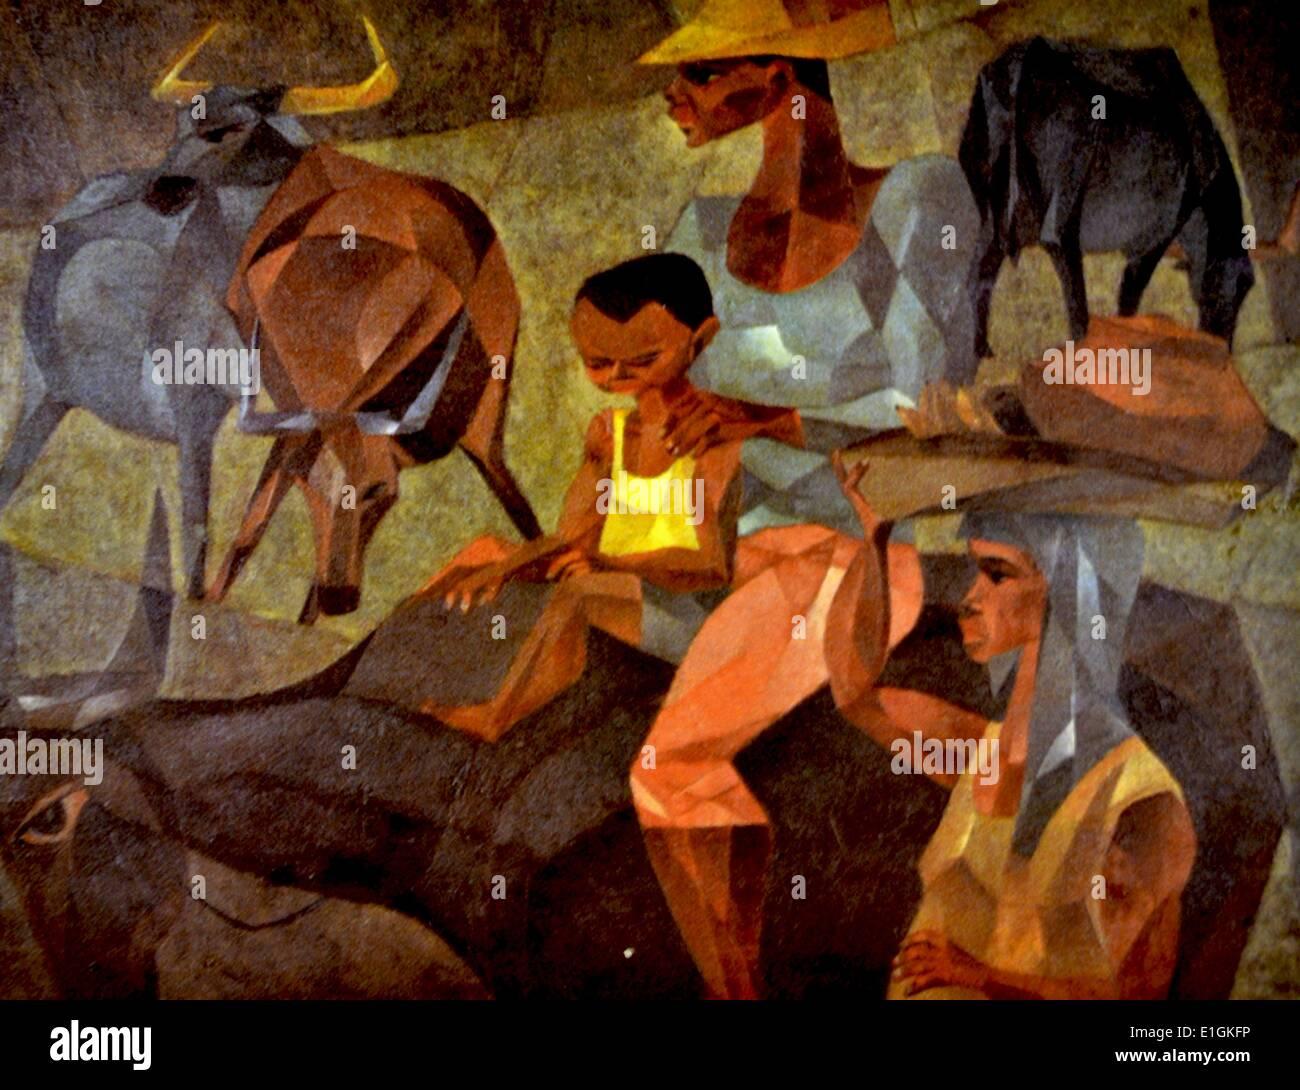 Hugo C. Yonzon, Early Risers, 1957. Oil on board. - Stock Image